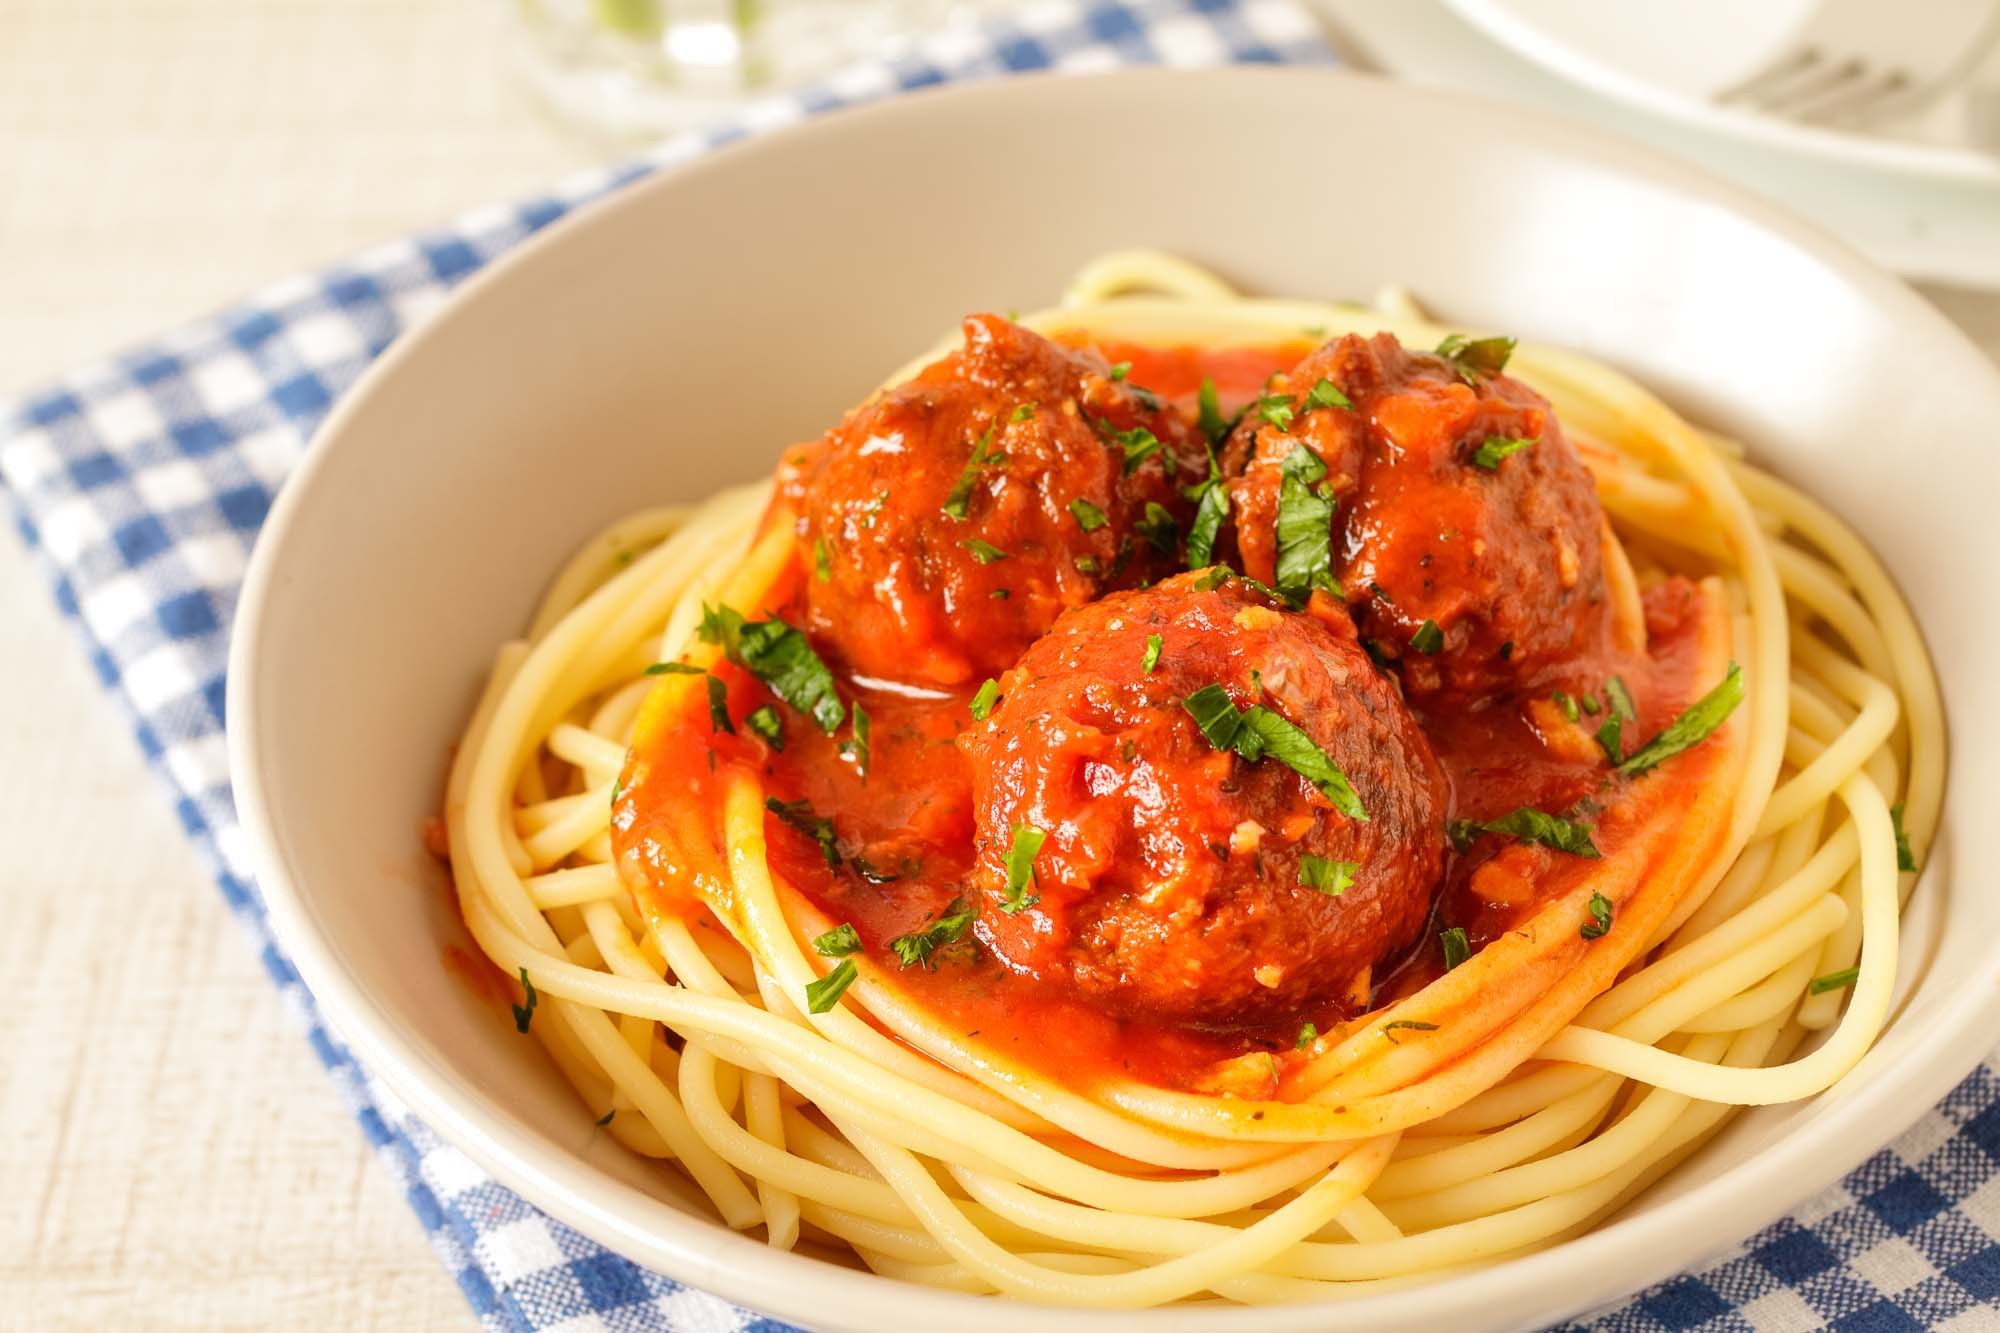 Lækker pasta med kødboller og tomatsauce